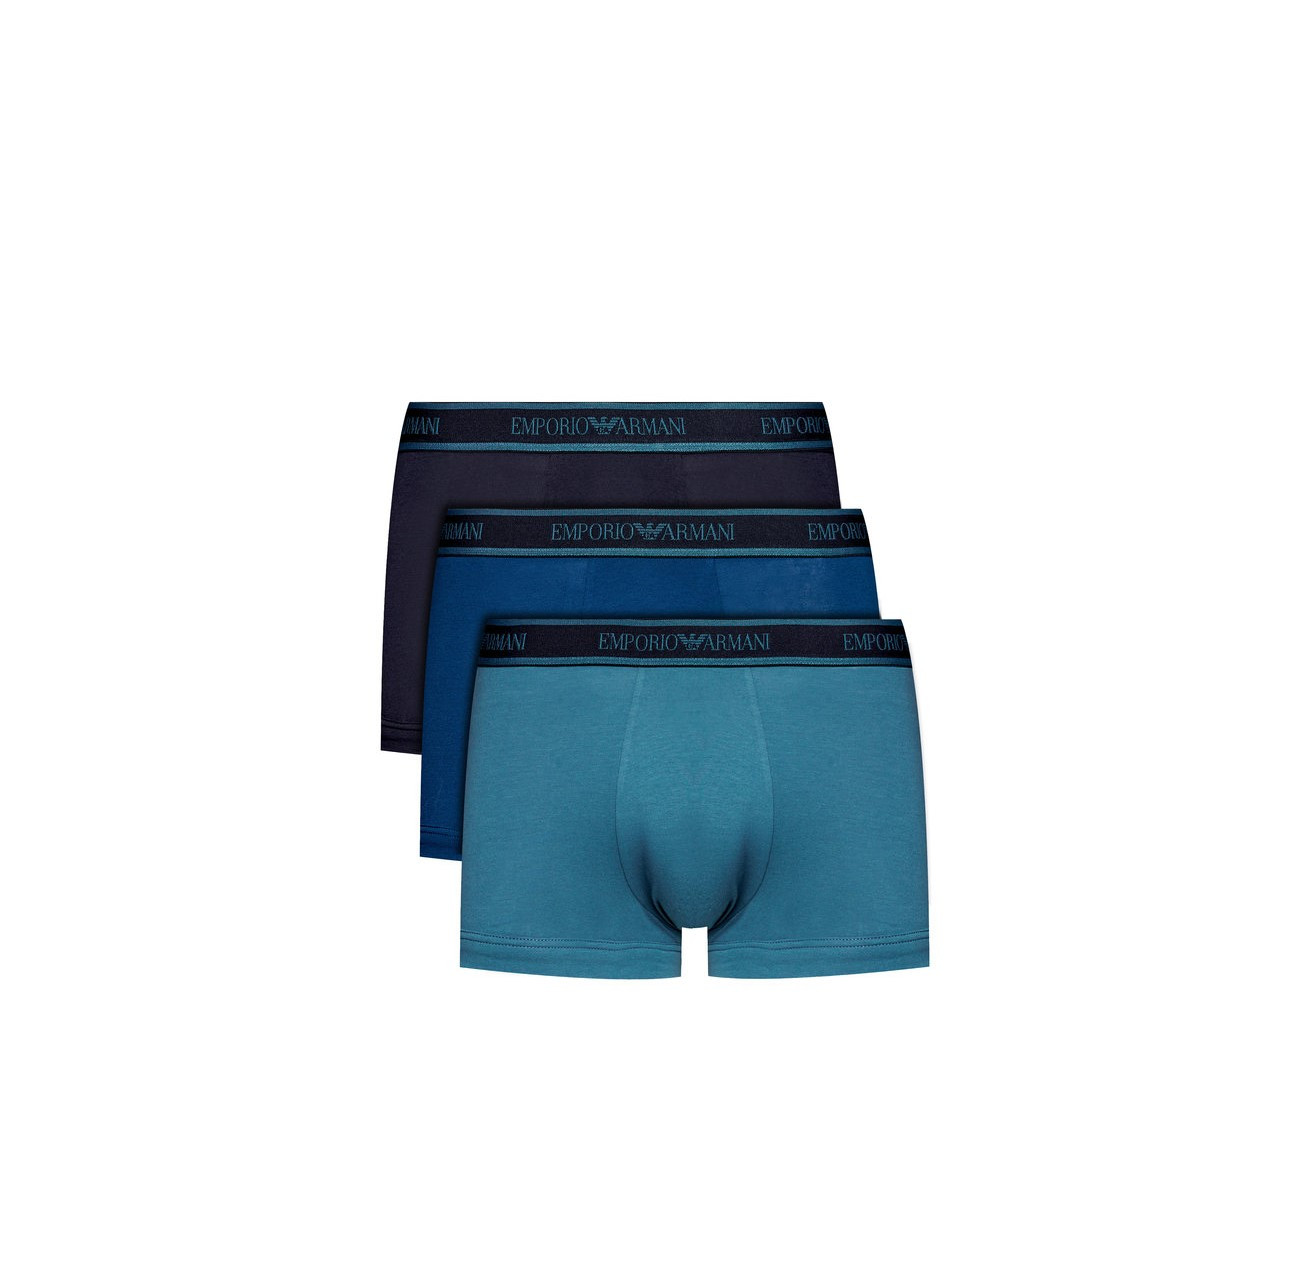 Armani Emporio Armani pánské boxerky | 3 ks - modré